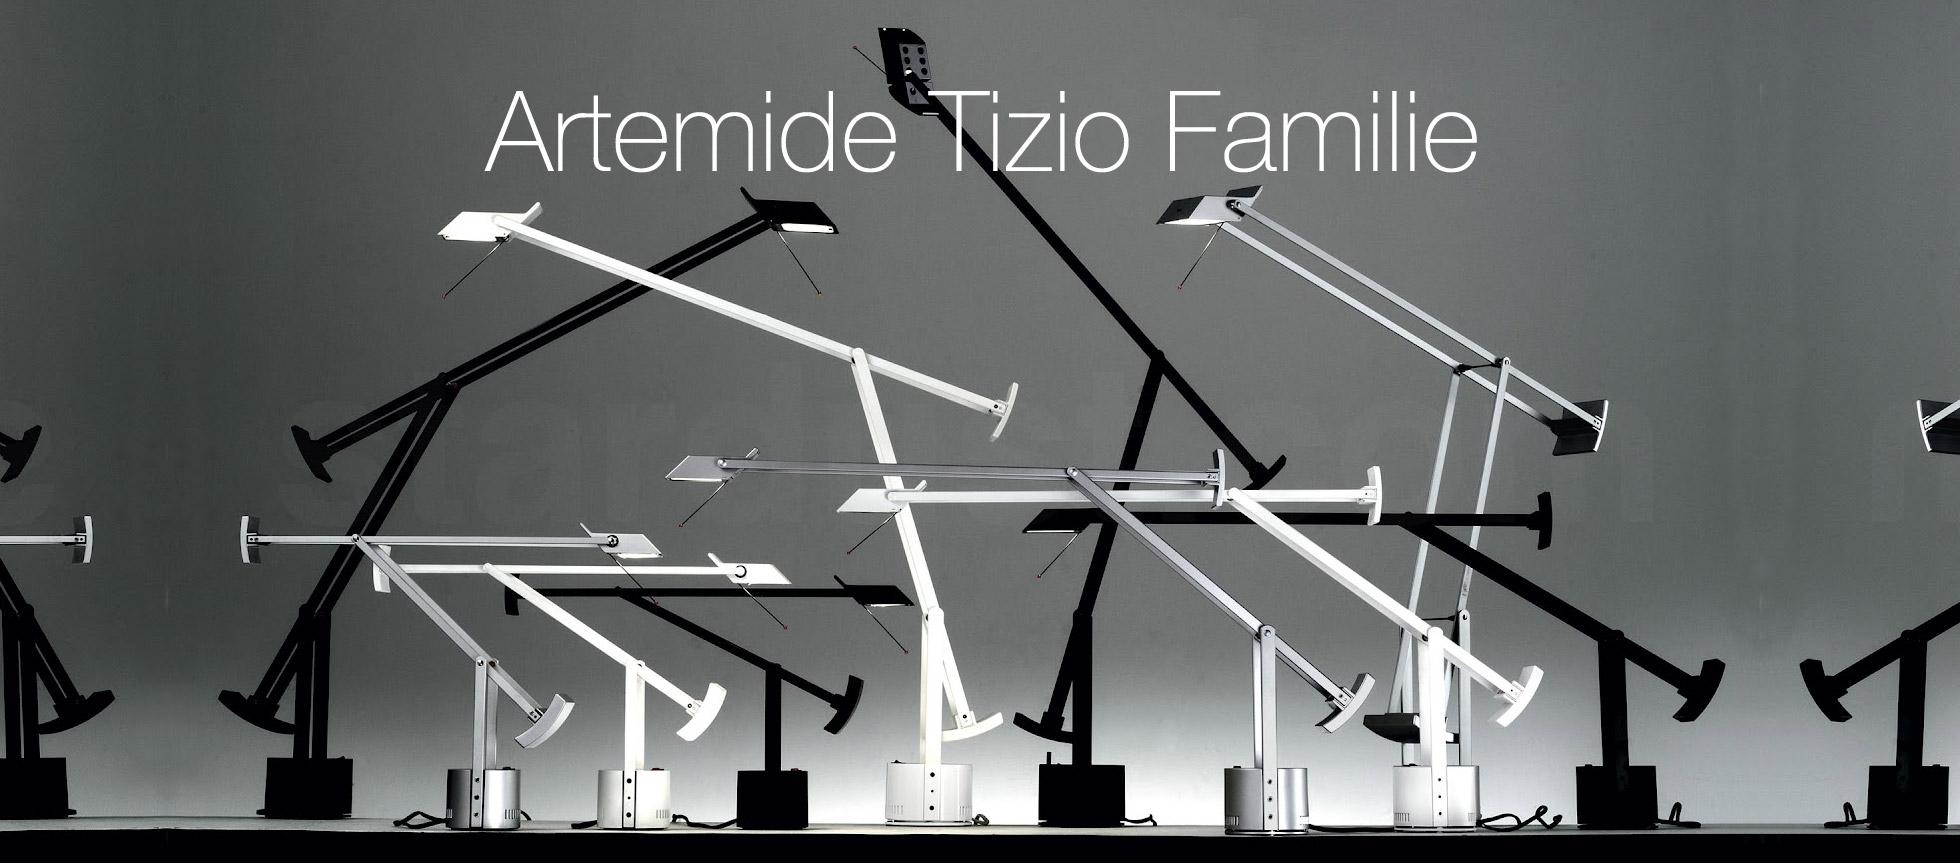 Artemide Tizio Familie